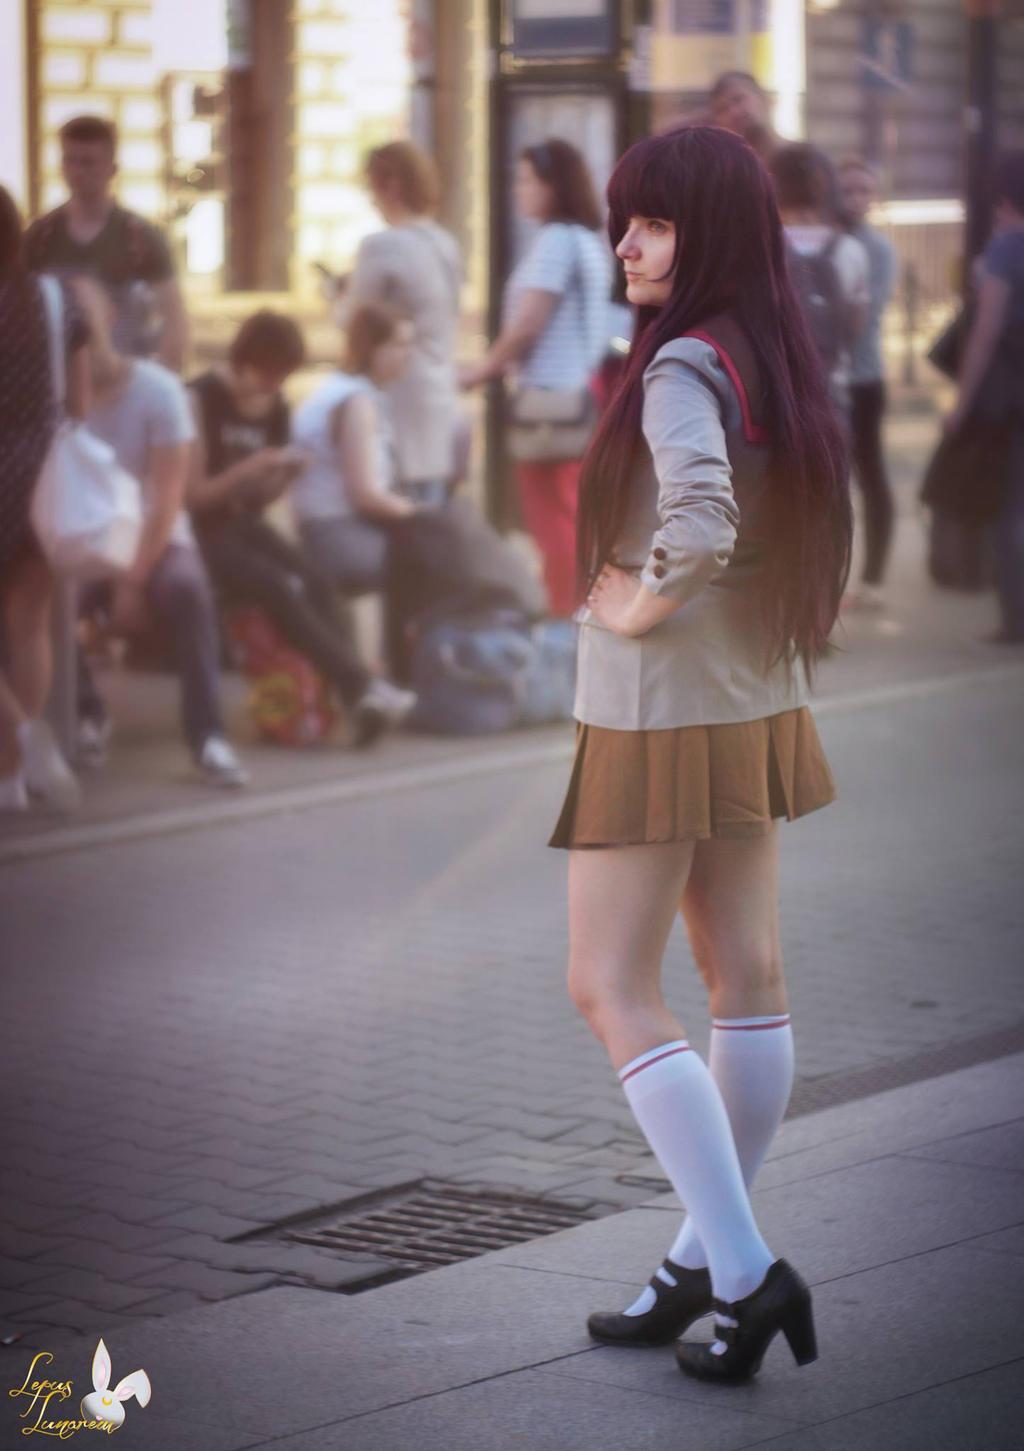 She is always late... baka Usagi! by LepusLunarem